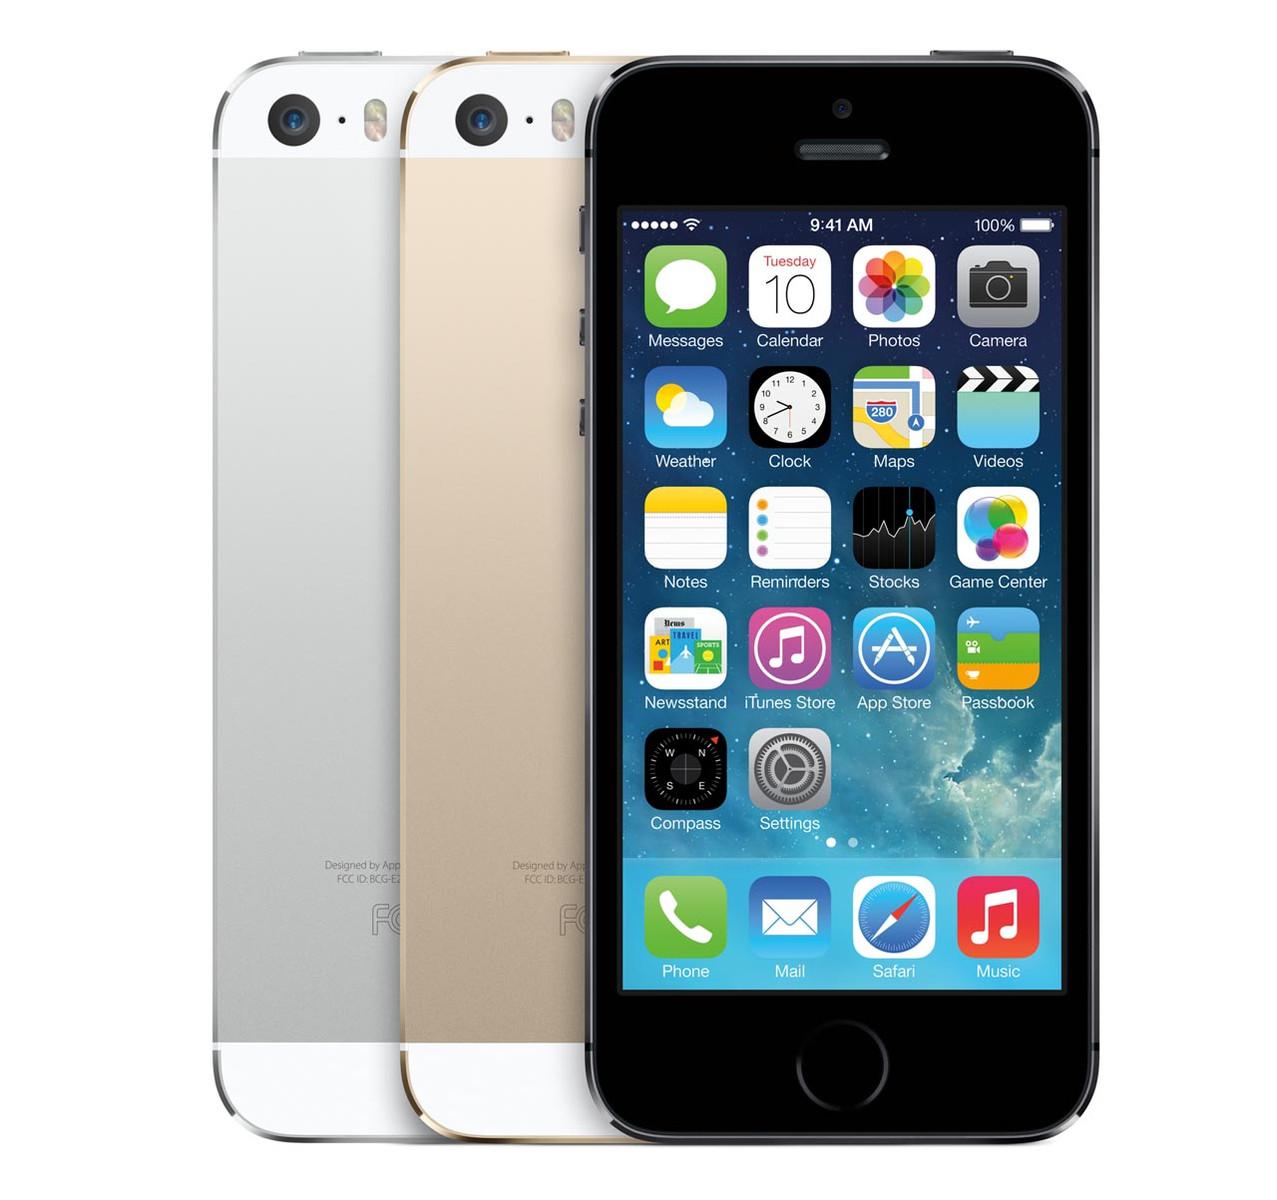 AppleiPhones